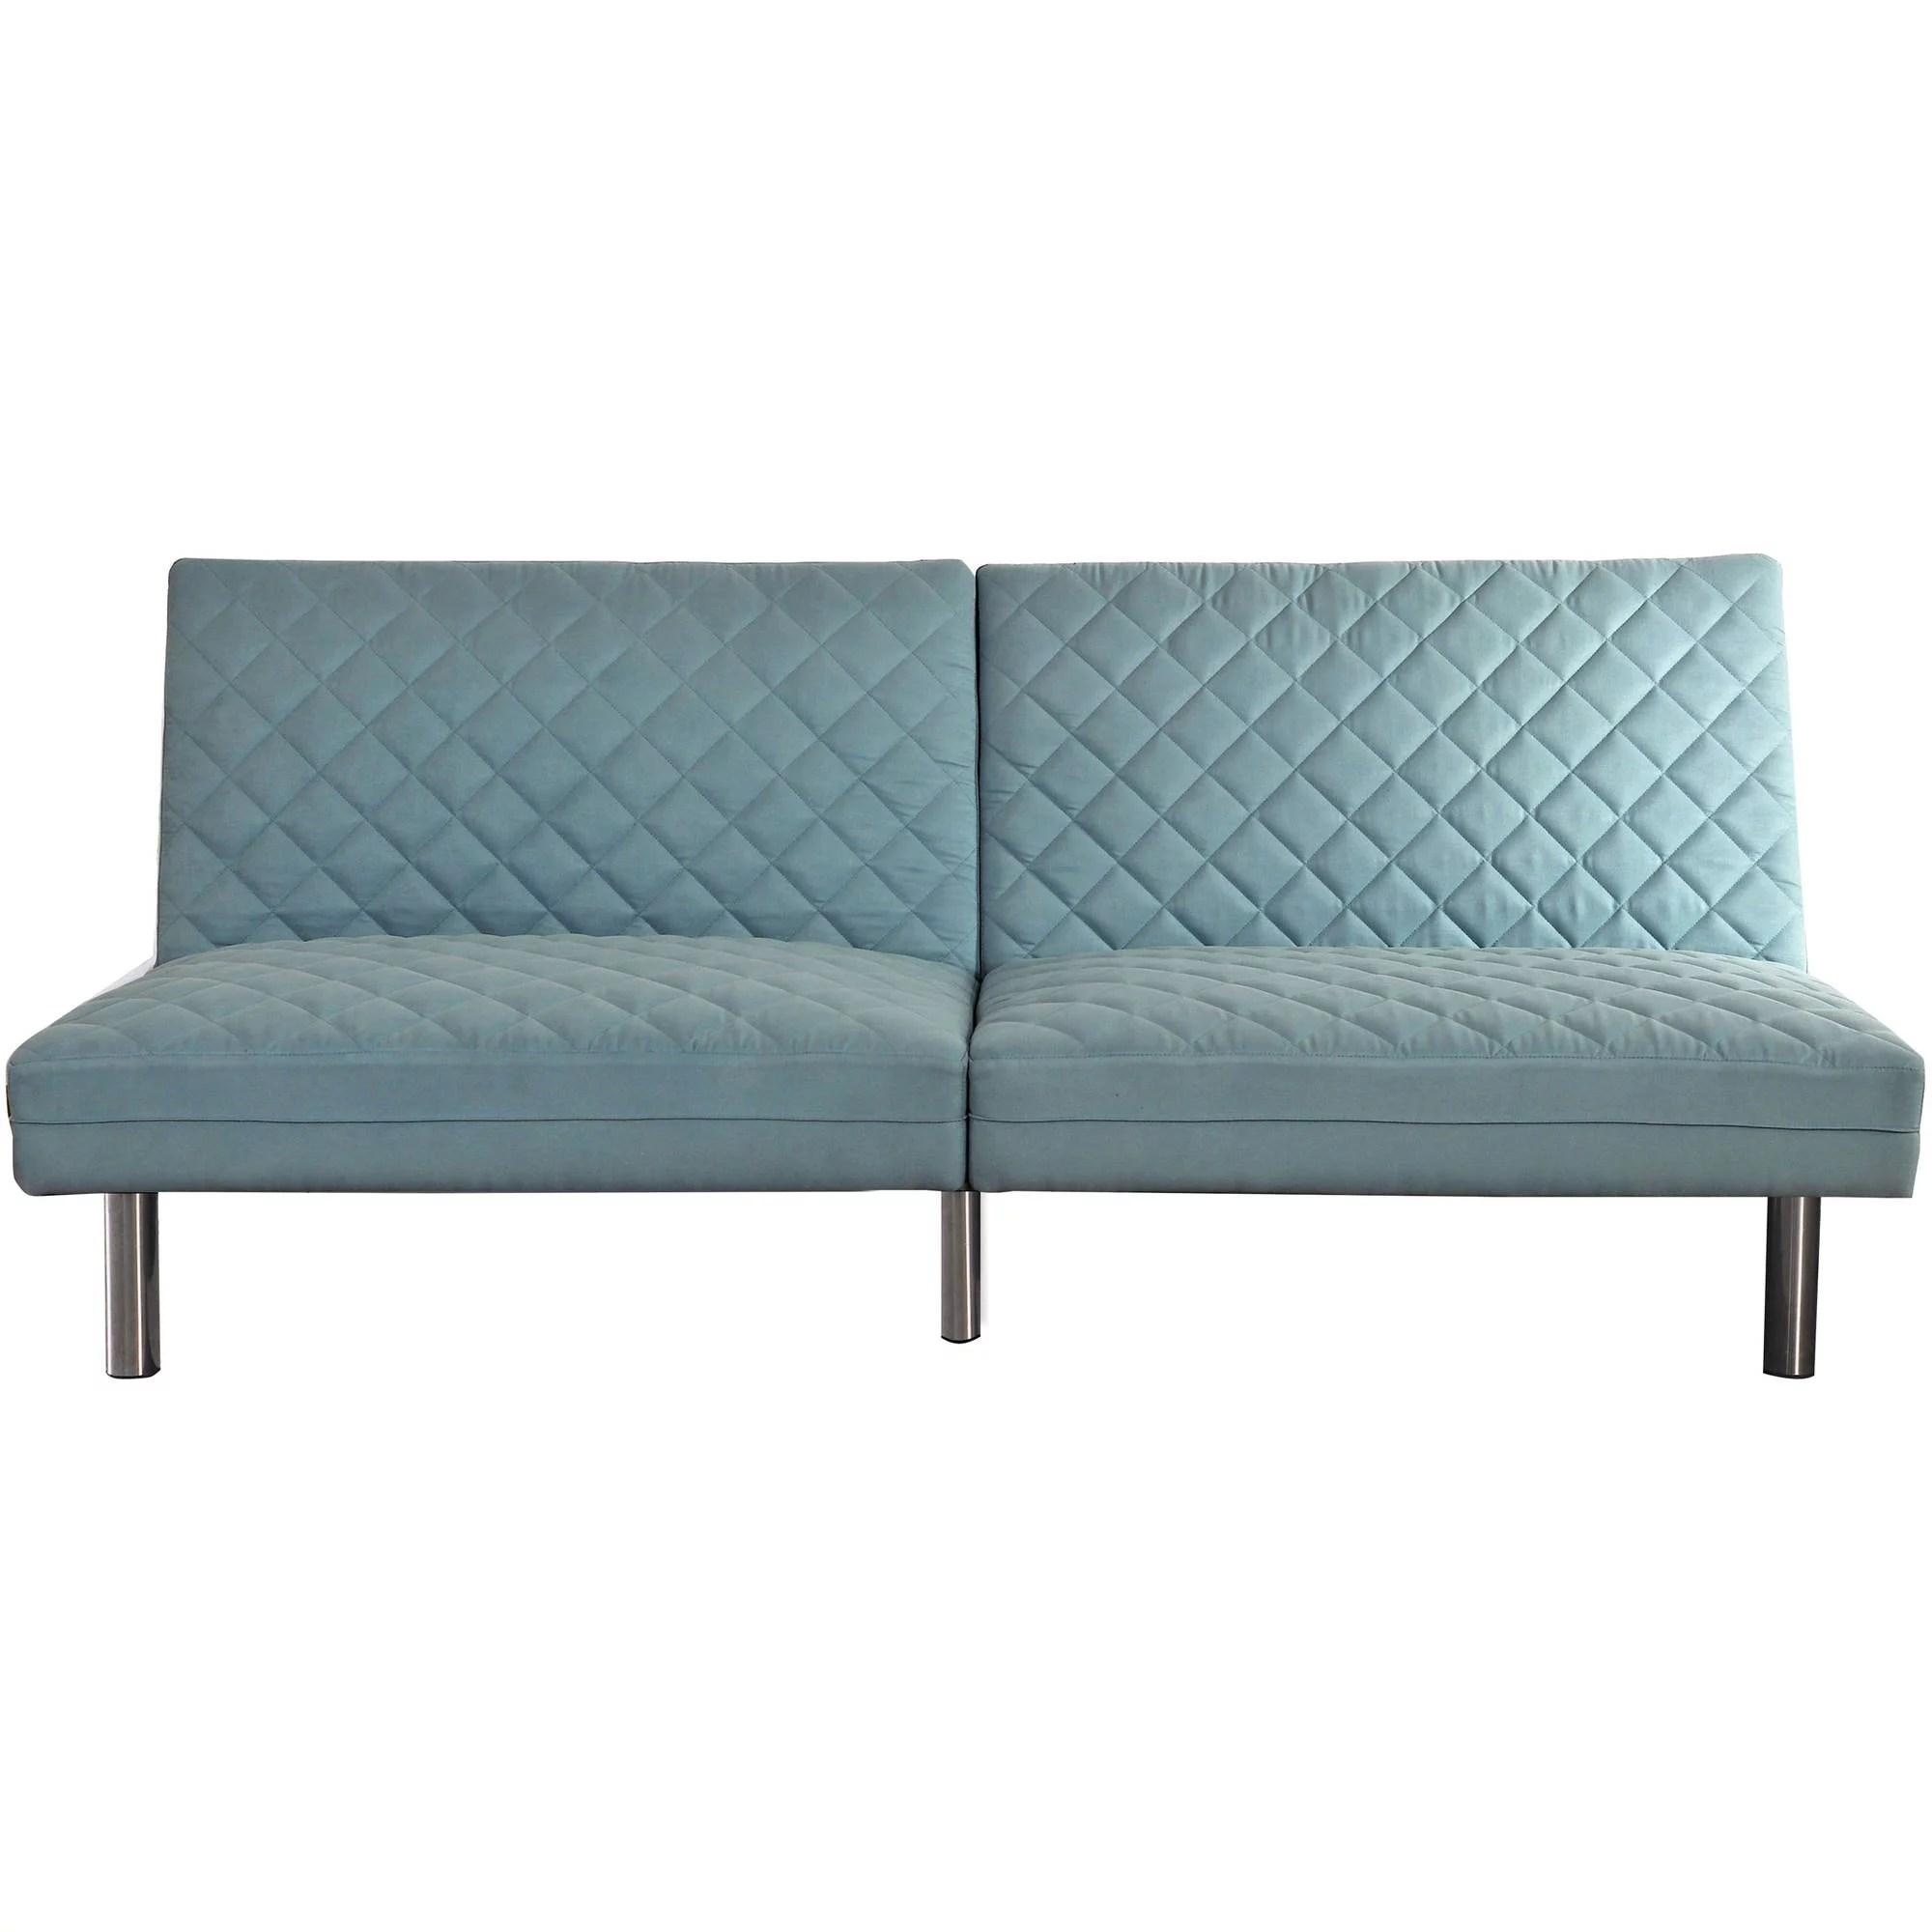 mainstays memory foam quilted futon multiple colors walmart com